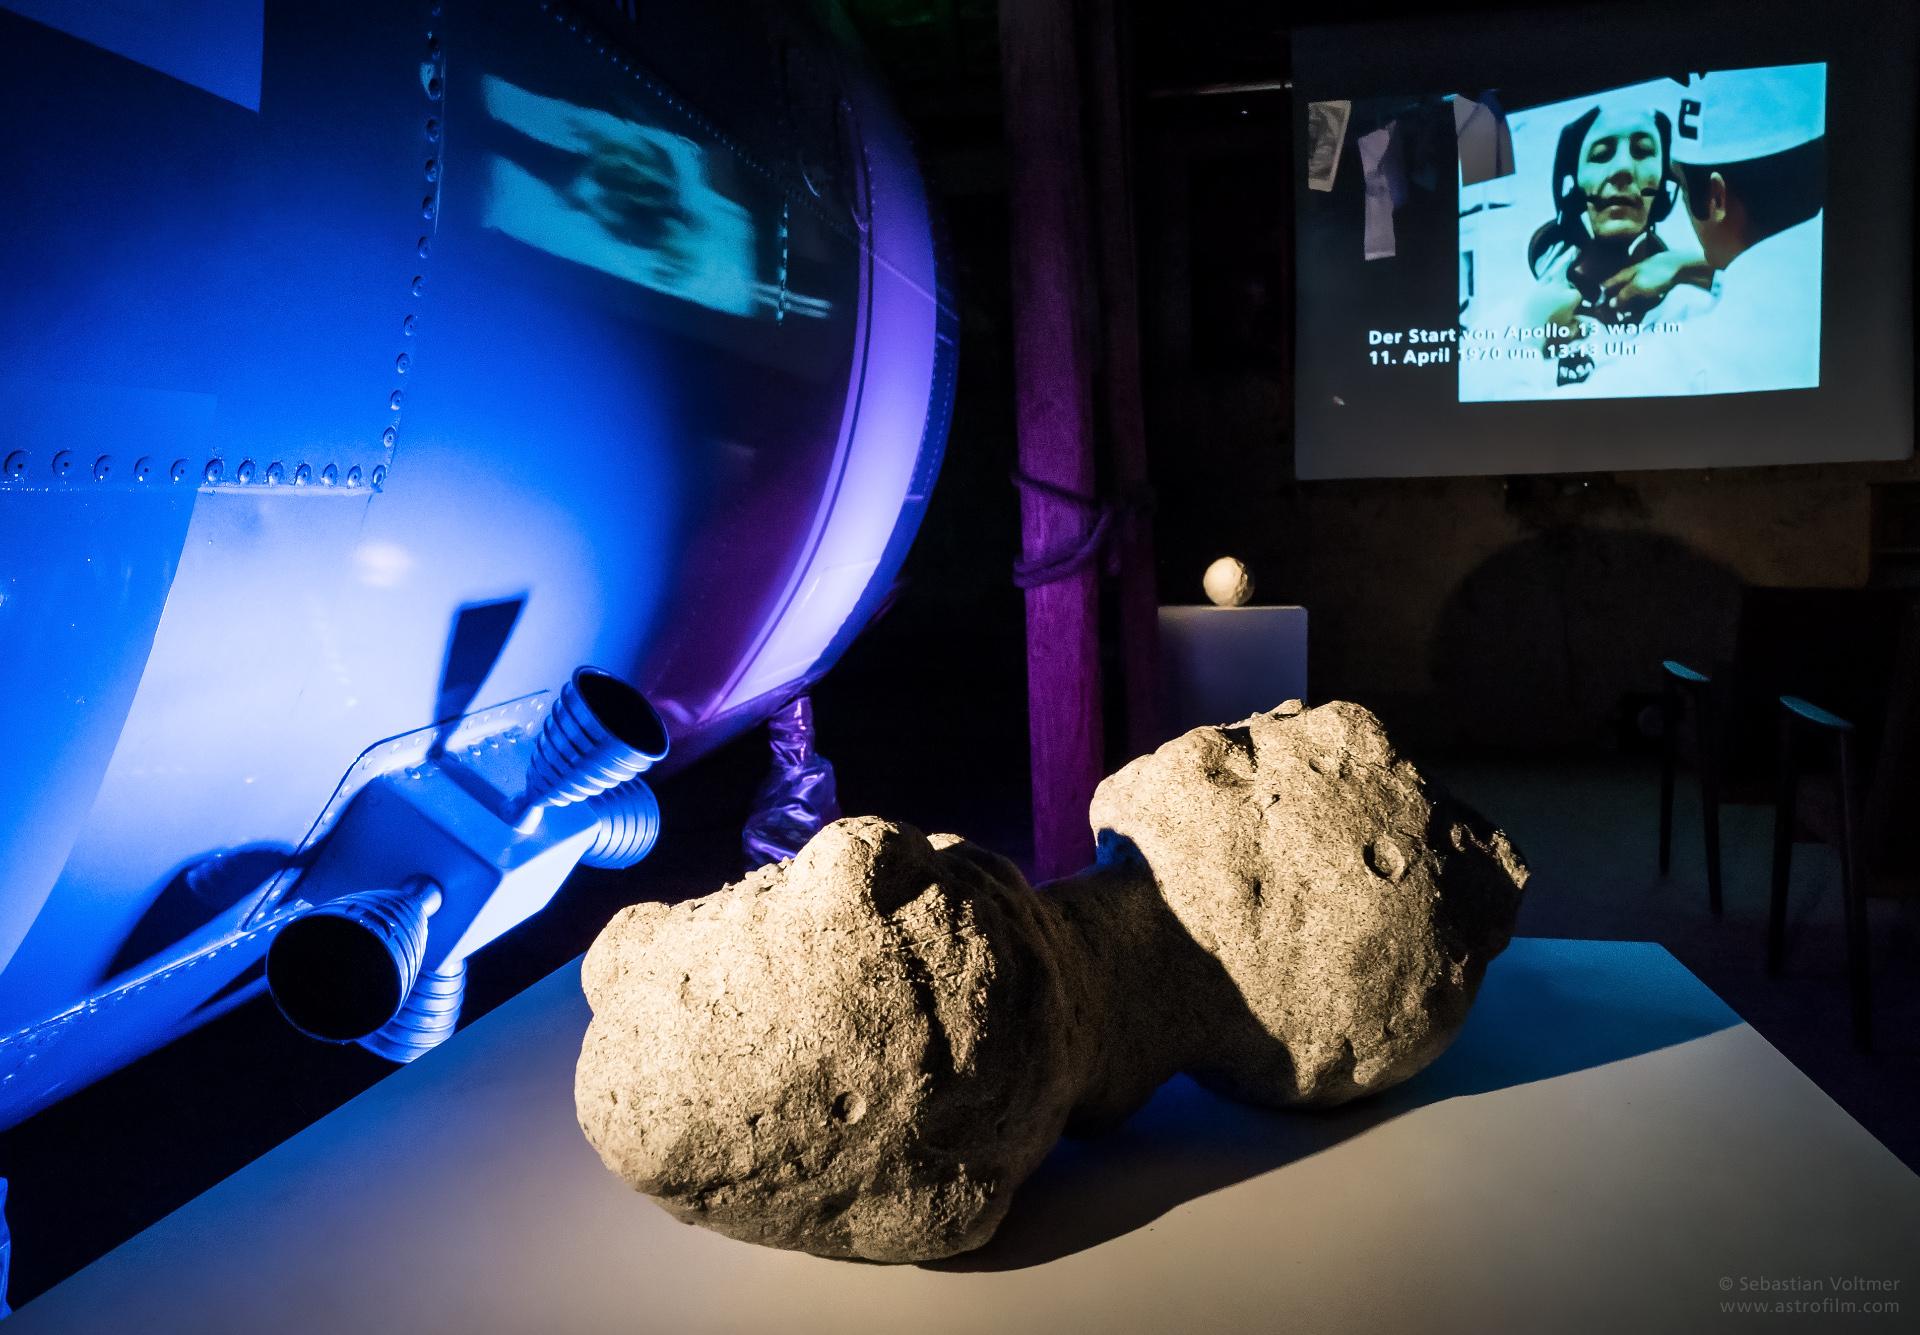 Kometenkern-Modell zum Anfassen